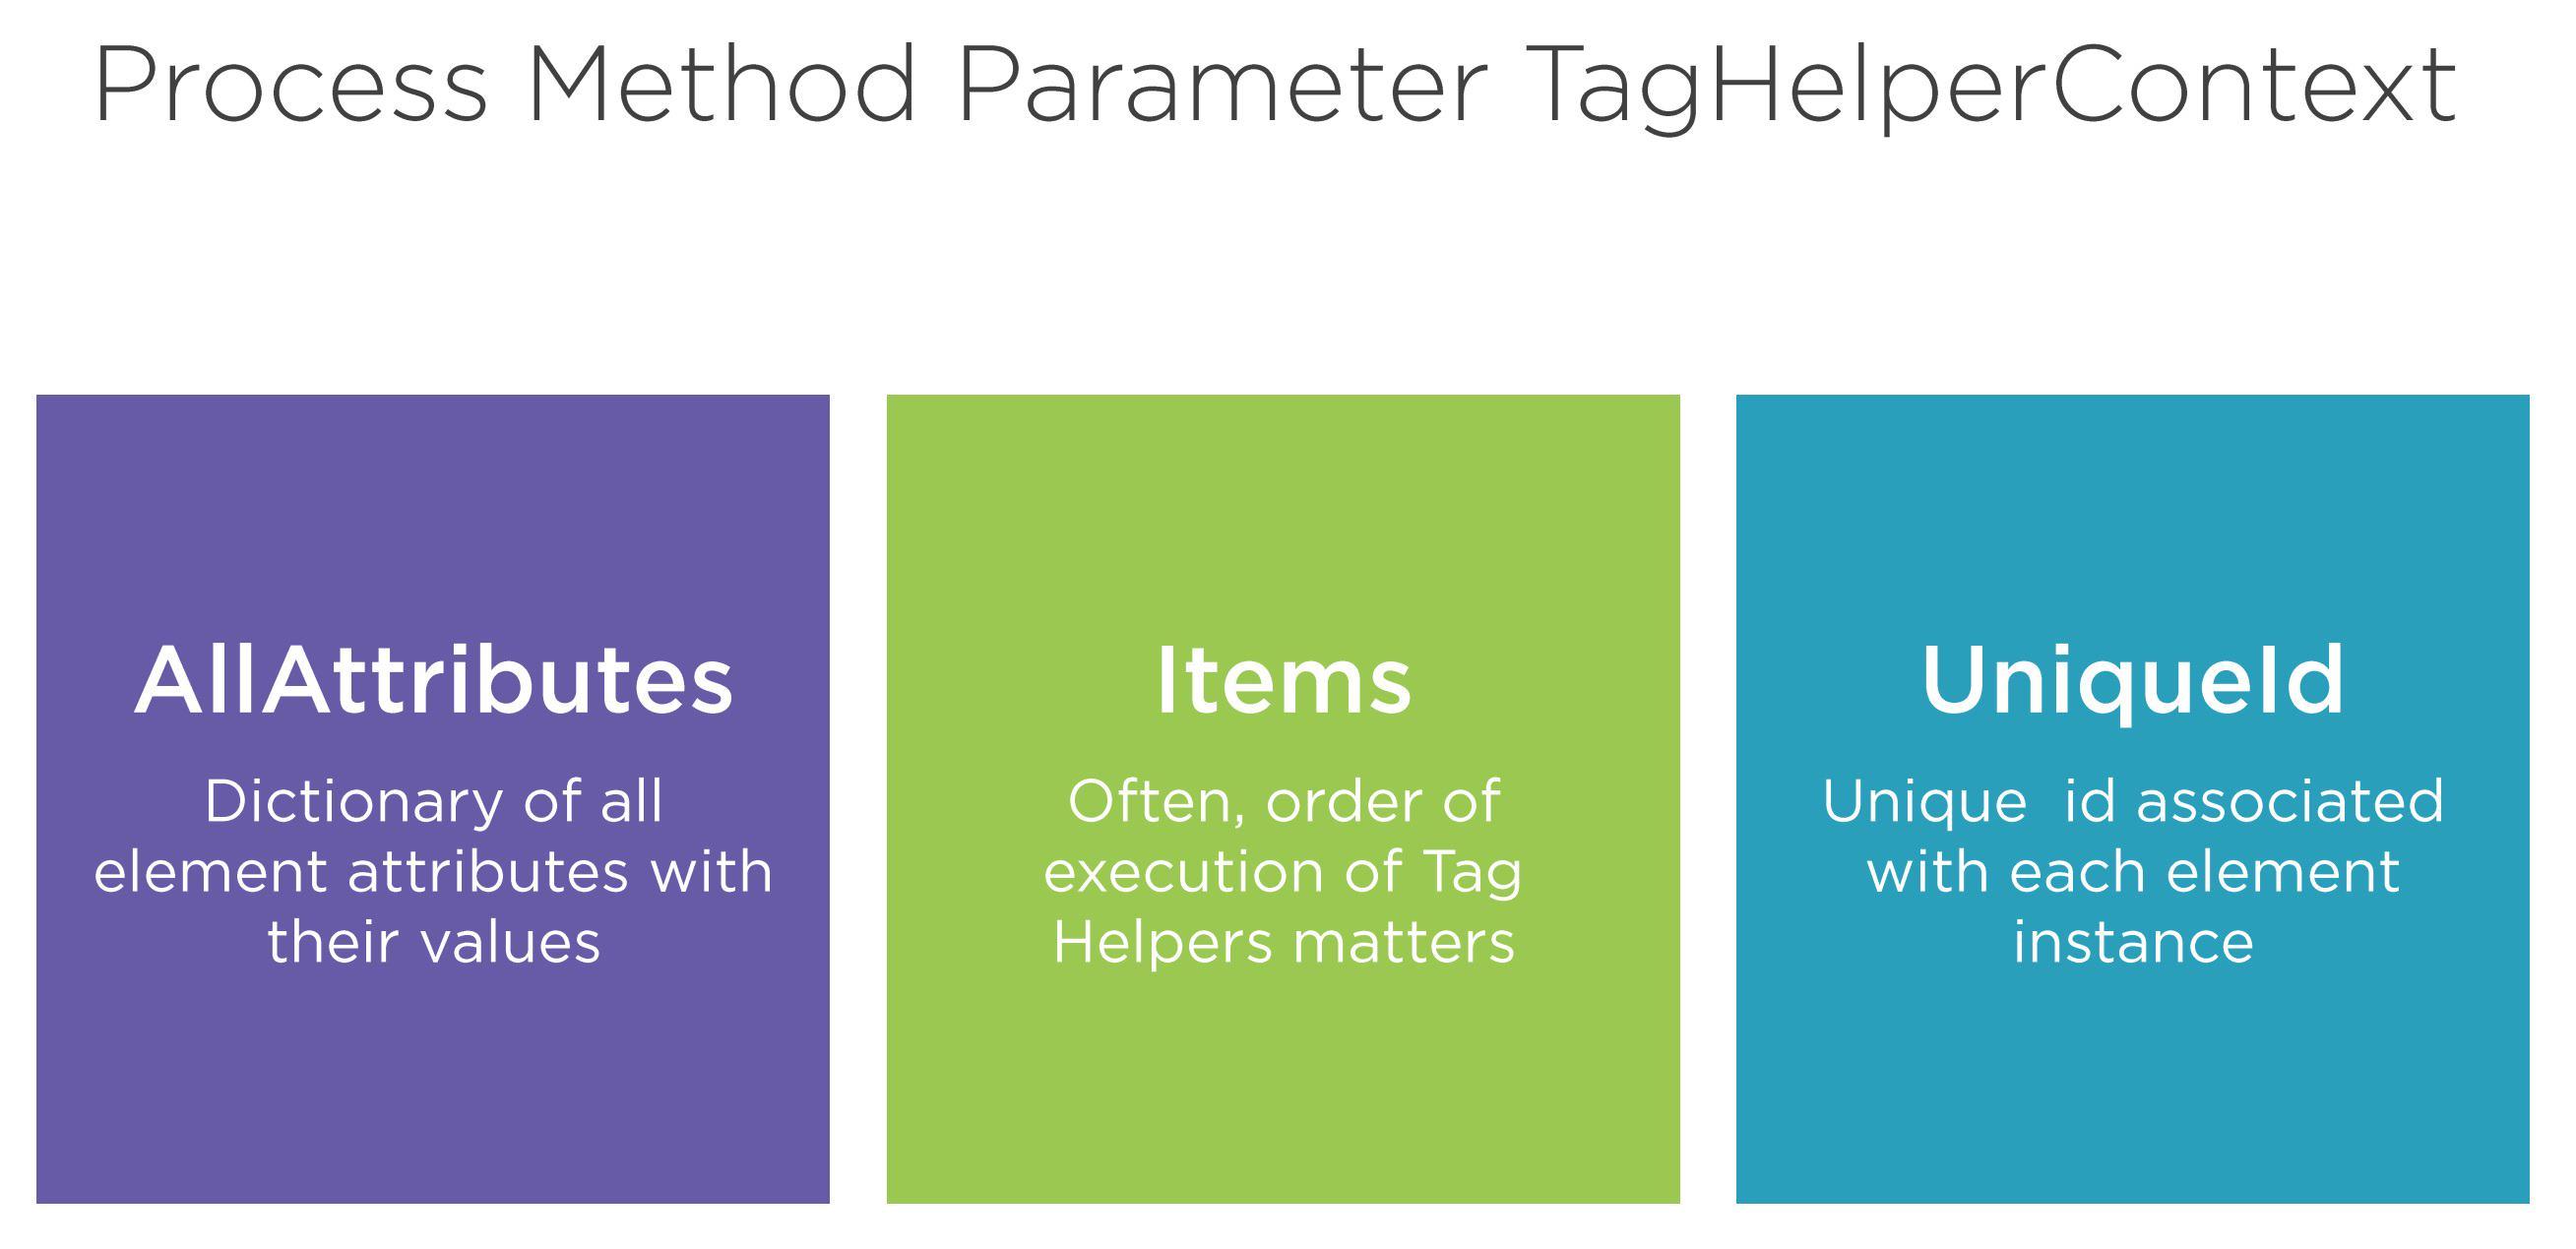 Process method parameter - TagHelperContext